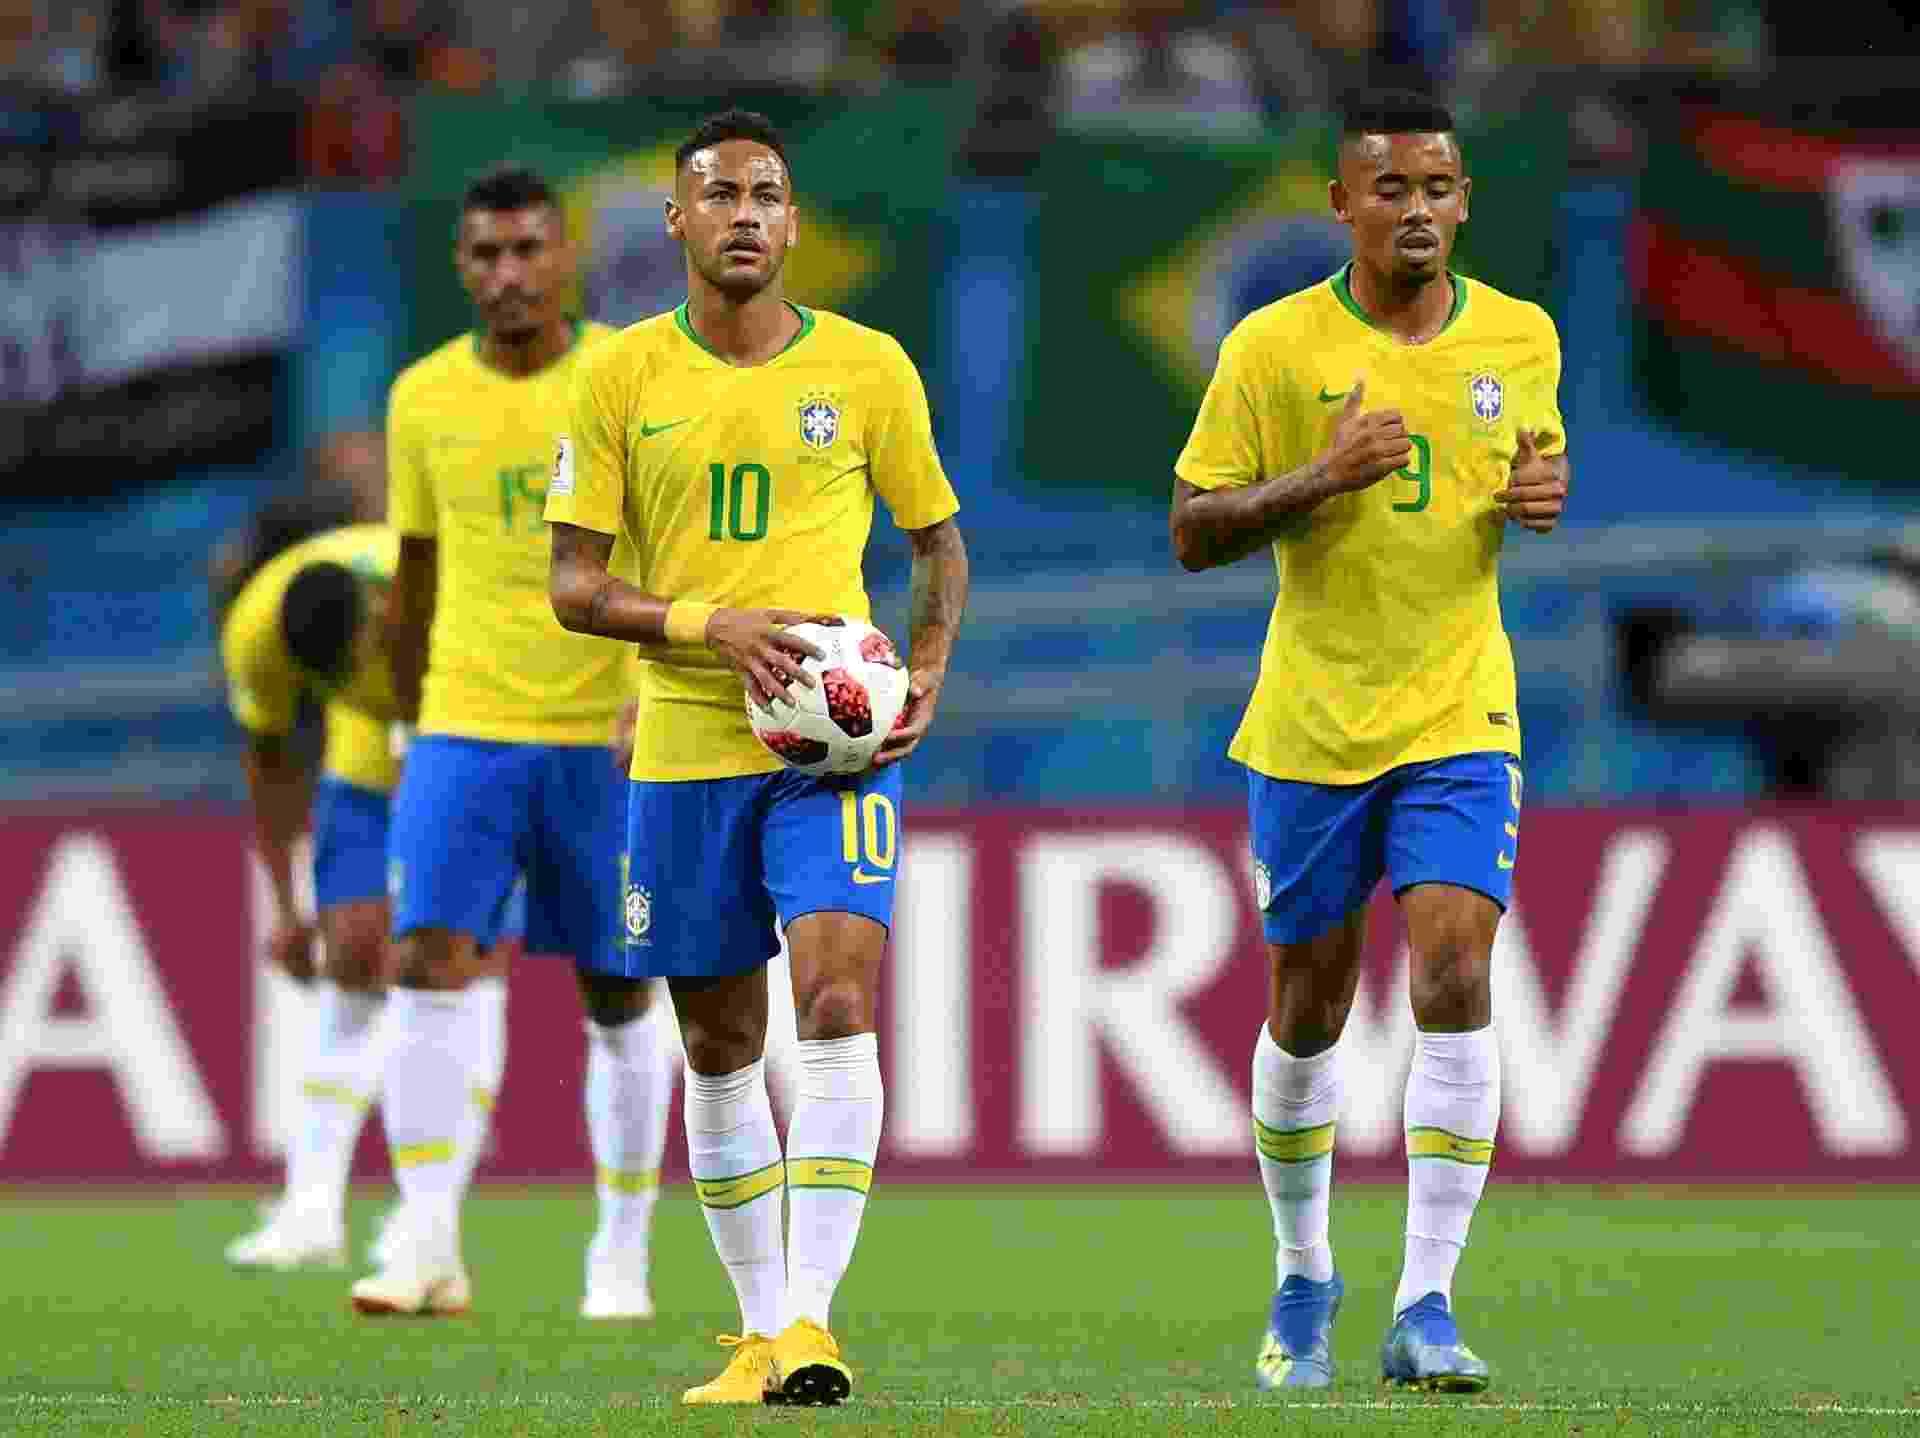 Neymar e Gabriel Jesus lamentam gol da Bélgica contra o Brasil - Shaun Botterill/Getty Images